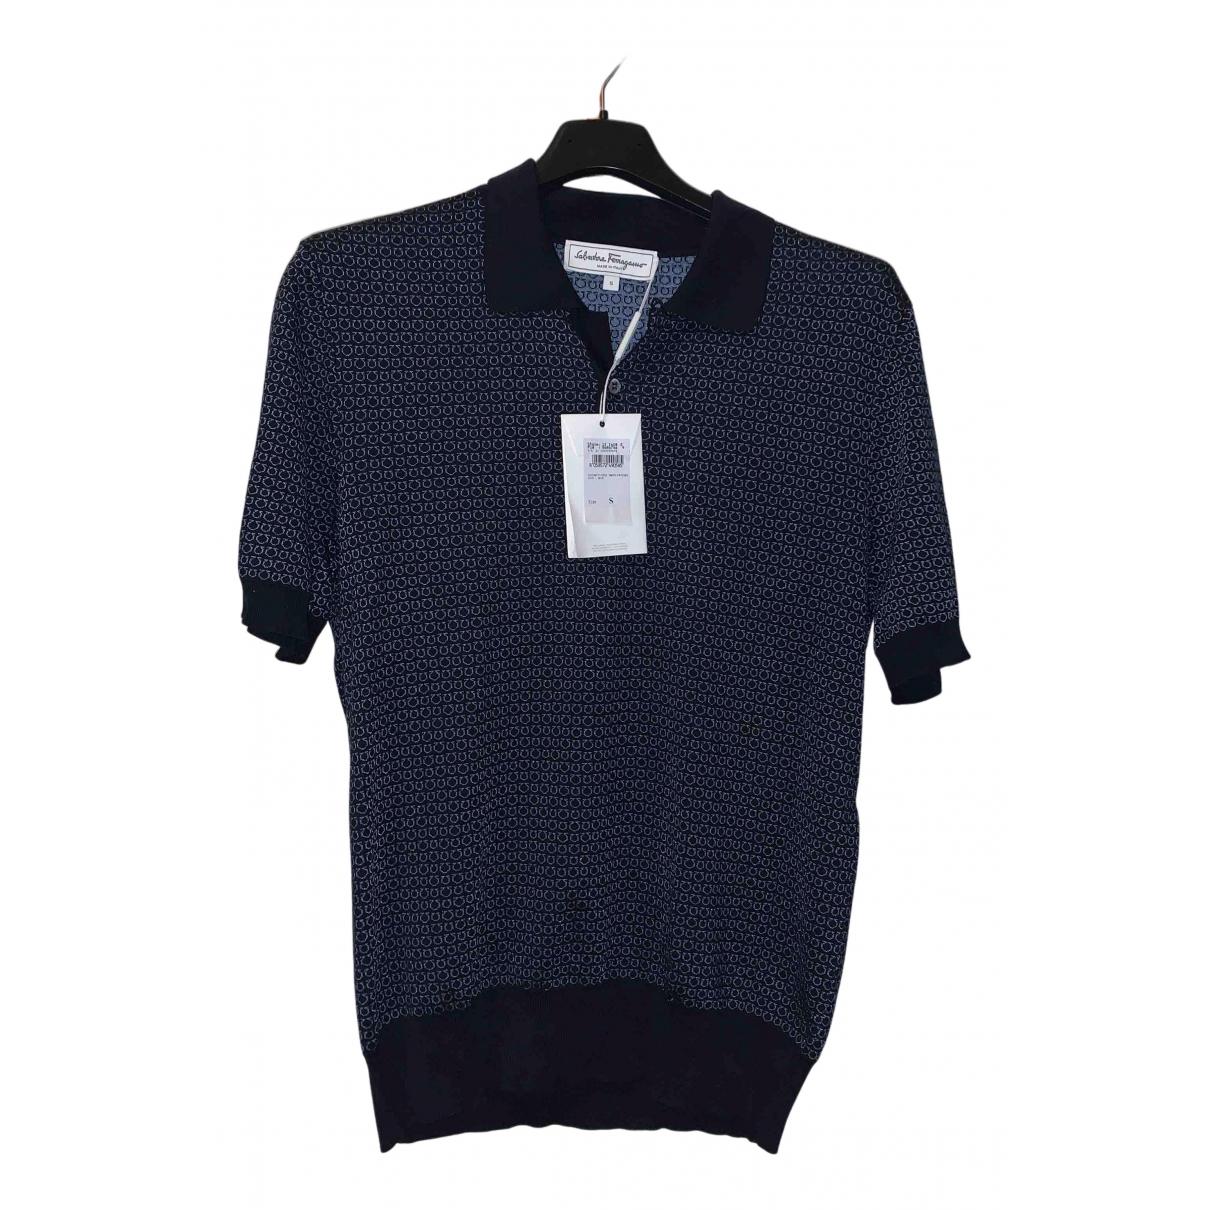 Salvatore Ferragamo - Polos   pour homme en coton - bleu